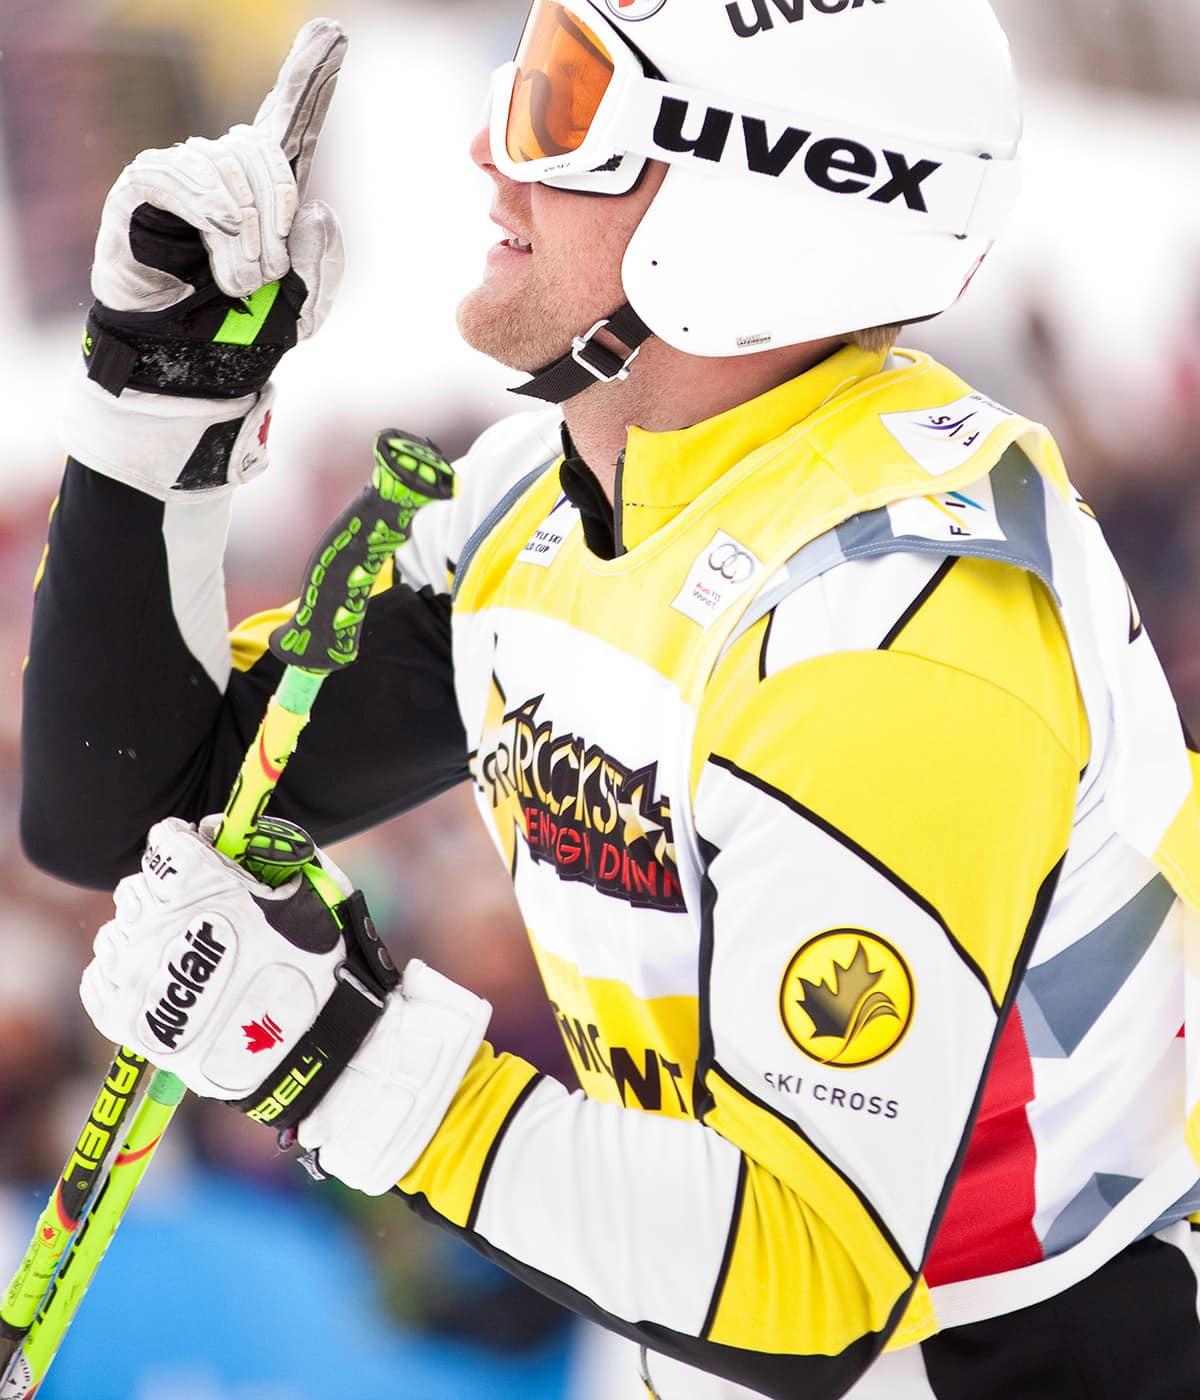 Canadian ski cross racer Brady Leman makes his own damn luck